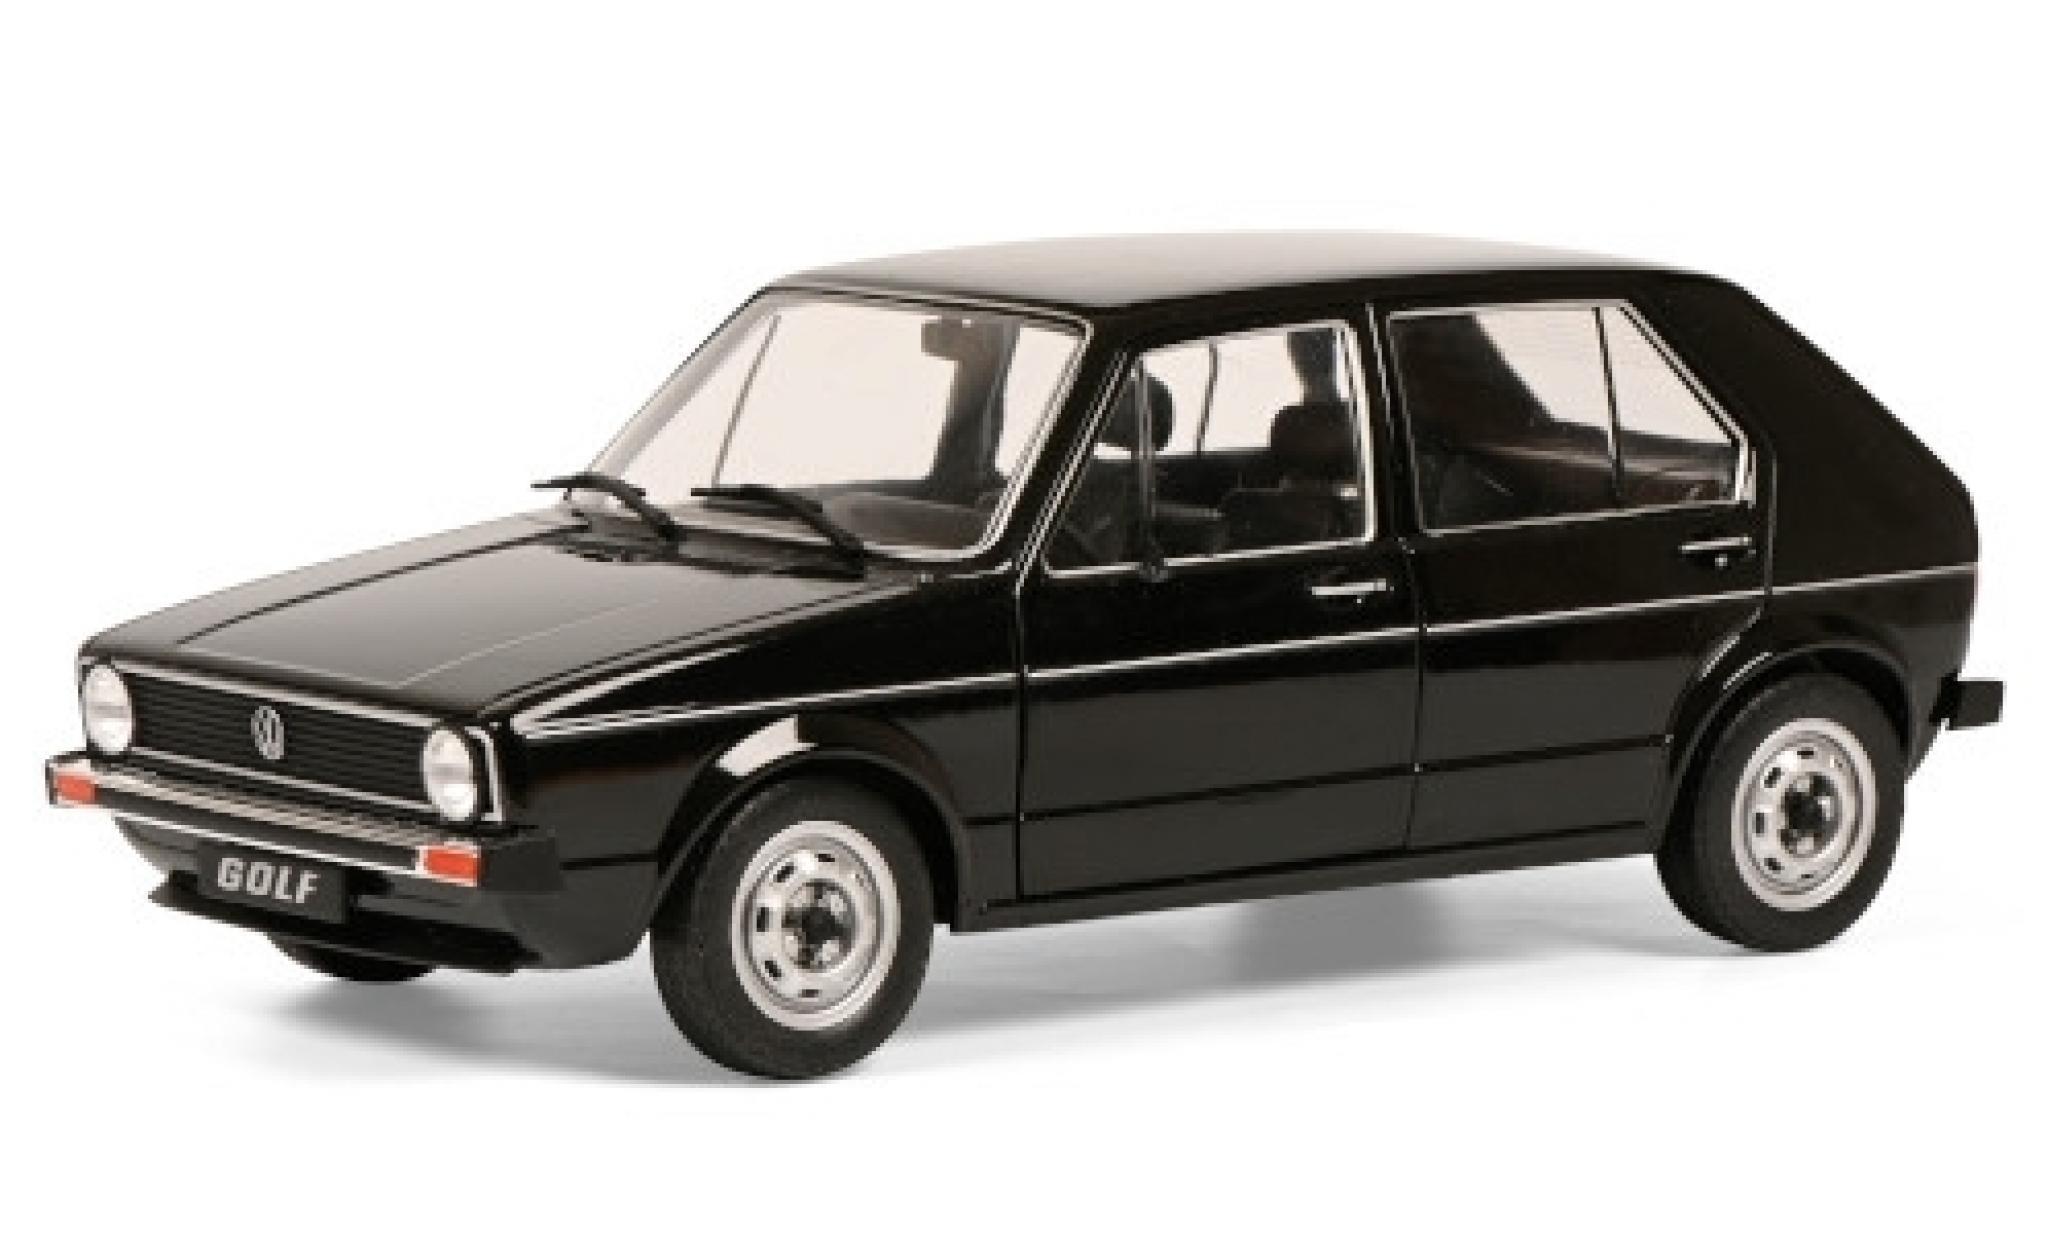 Volkswagen Golf 1/18 Solido I L black 1983